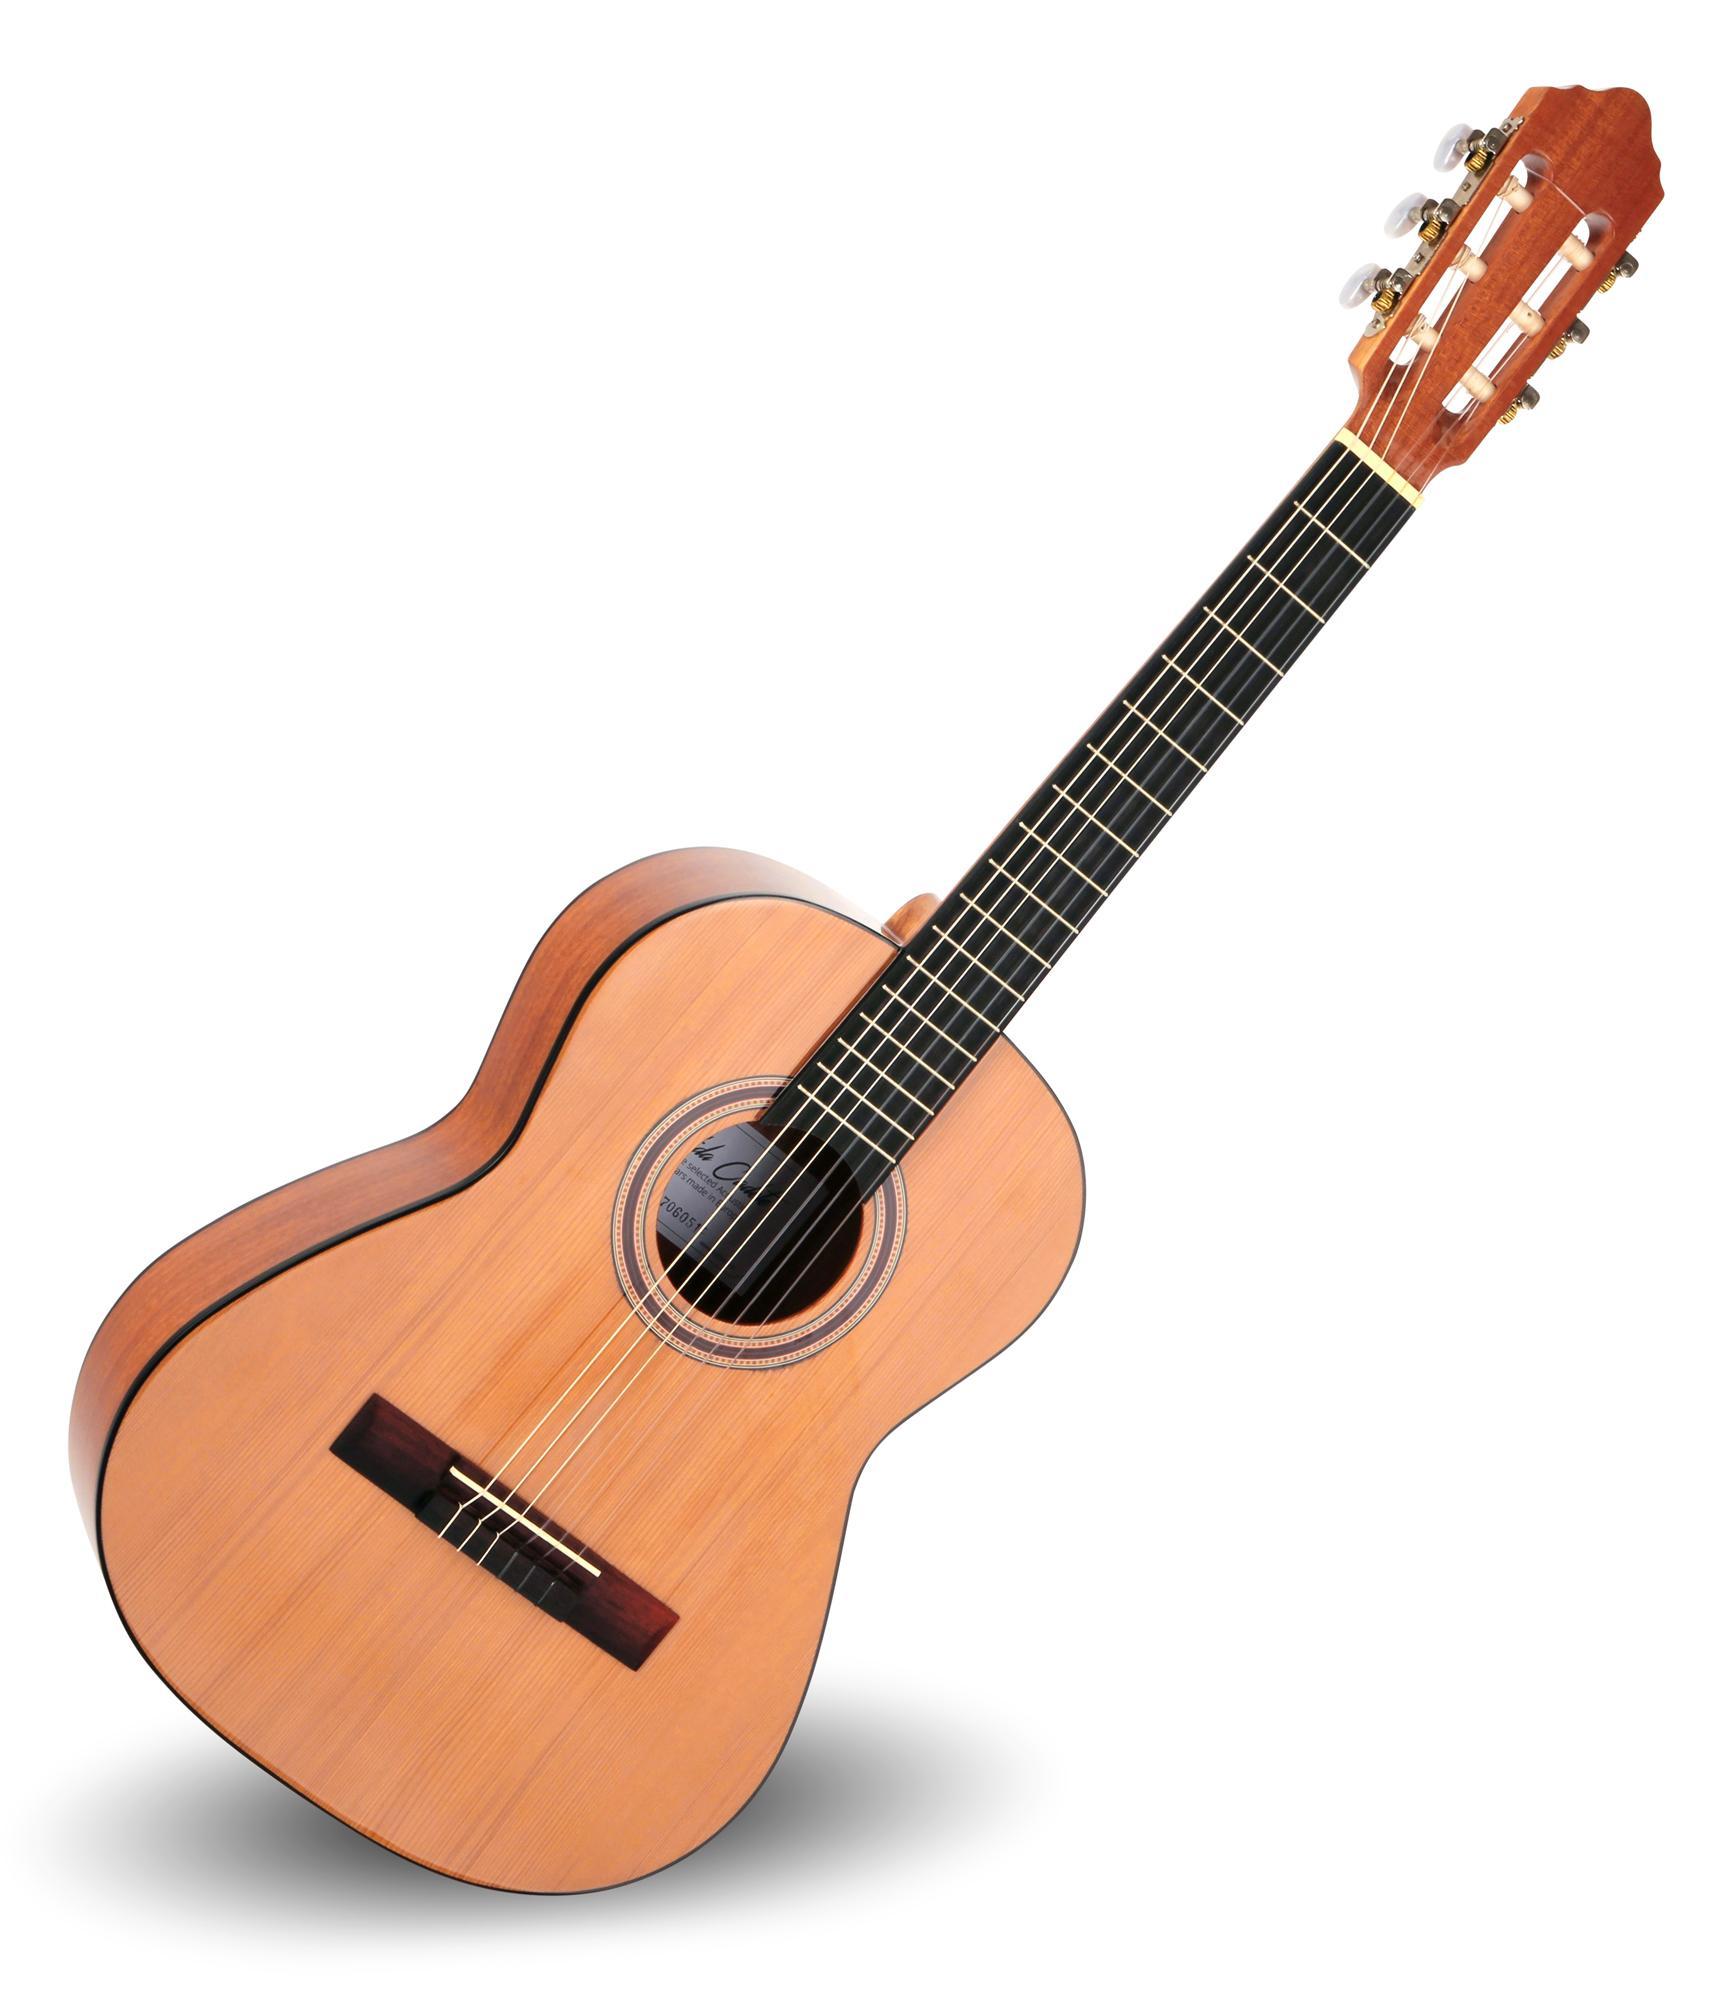 Calida Cadete Konzertgitarre 1|2 Zeder Hochglanz Made in Portugal